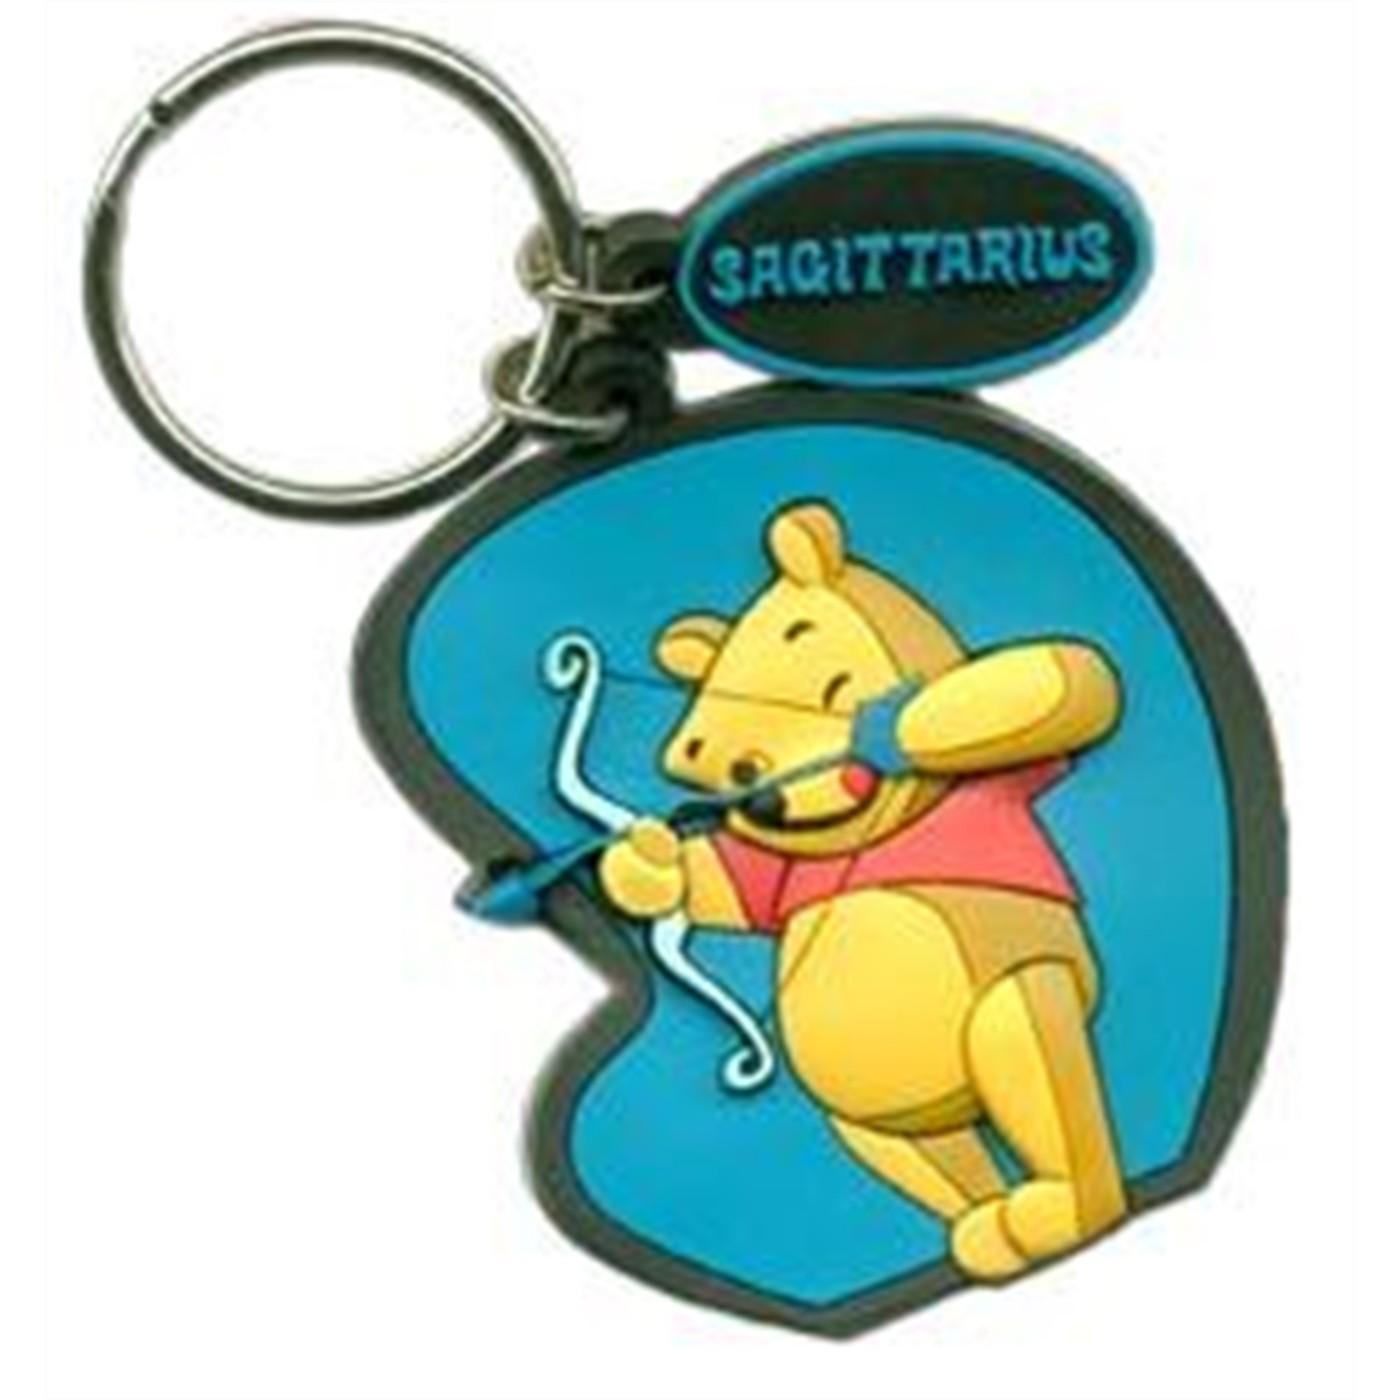 Disney Zodiac Keychain: Sagittarius - Pooh